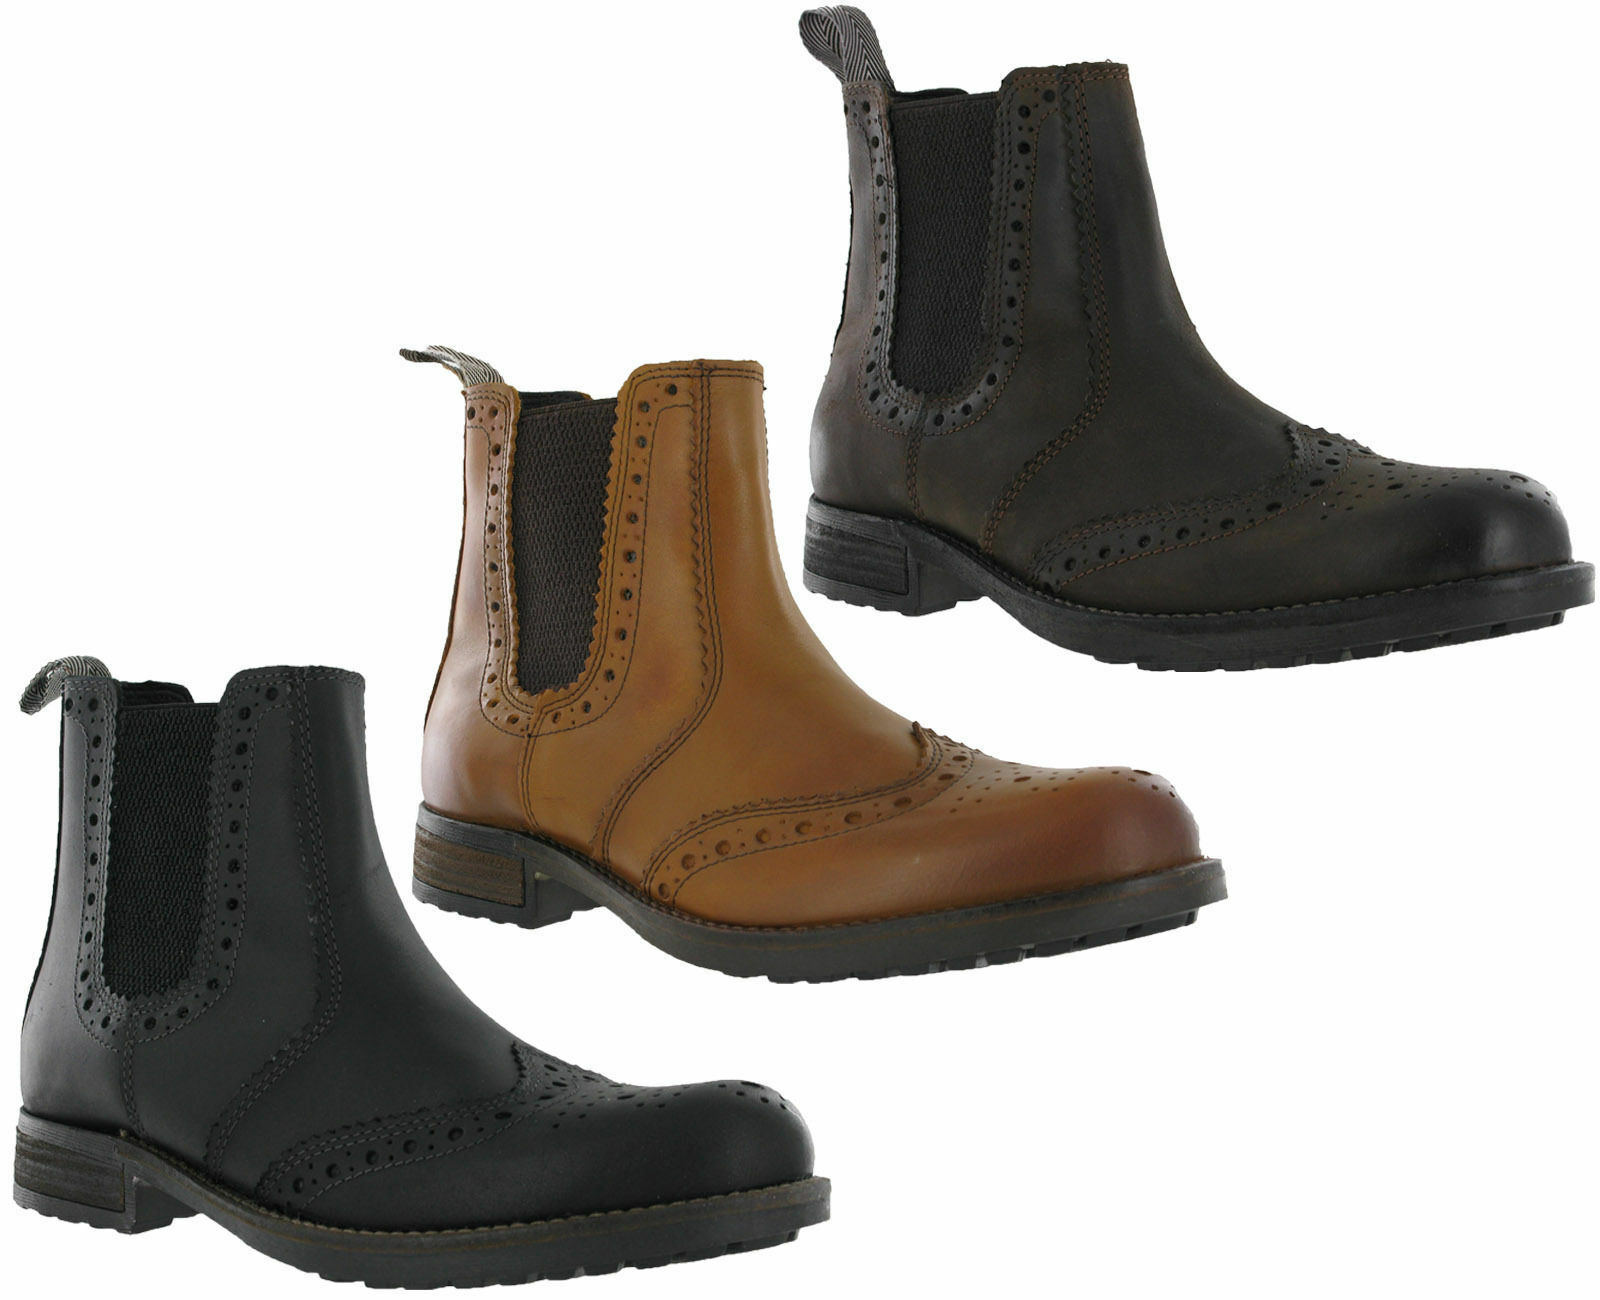 Roamers Dealer Brogues Gusset Caviglia in Pelle da Uomo Cuscino Pull On Stivali